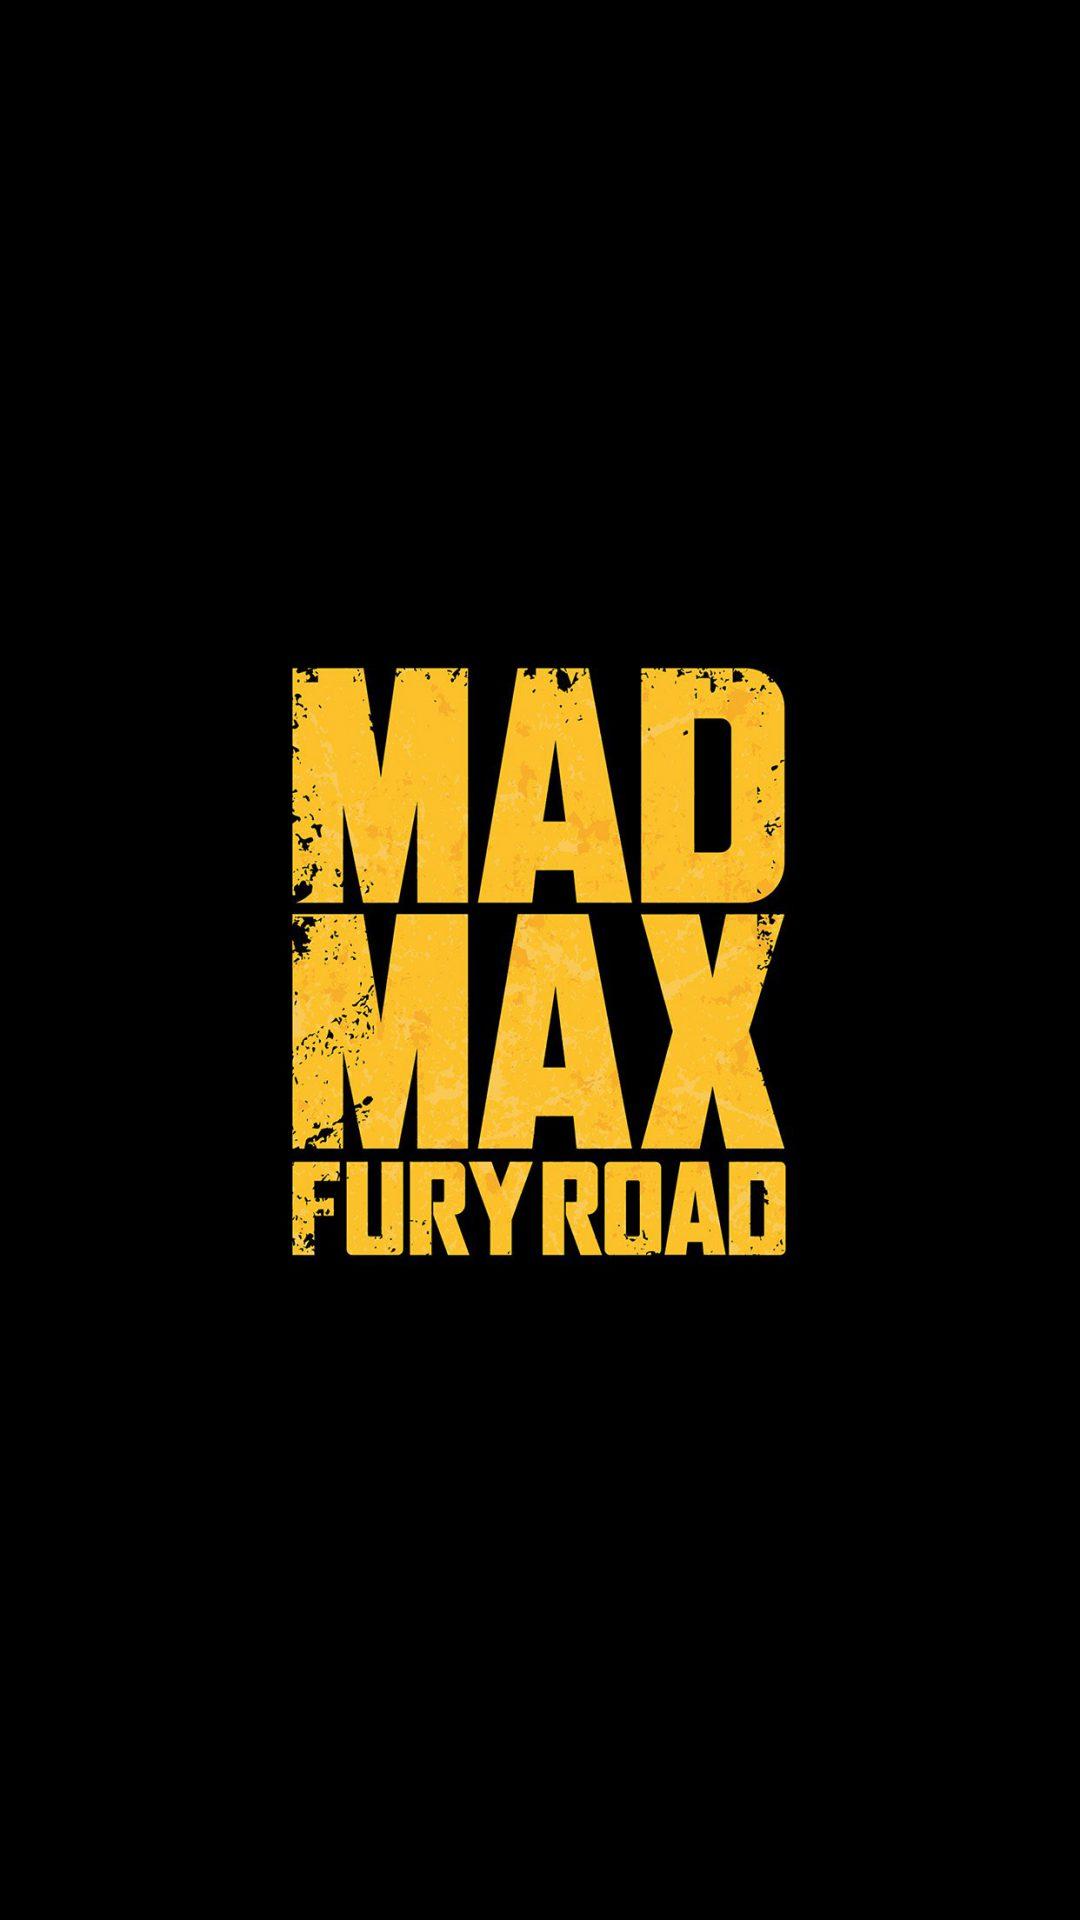 Madmax Furyroad Film Poster Minimal Logo Art Dark